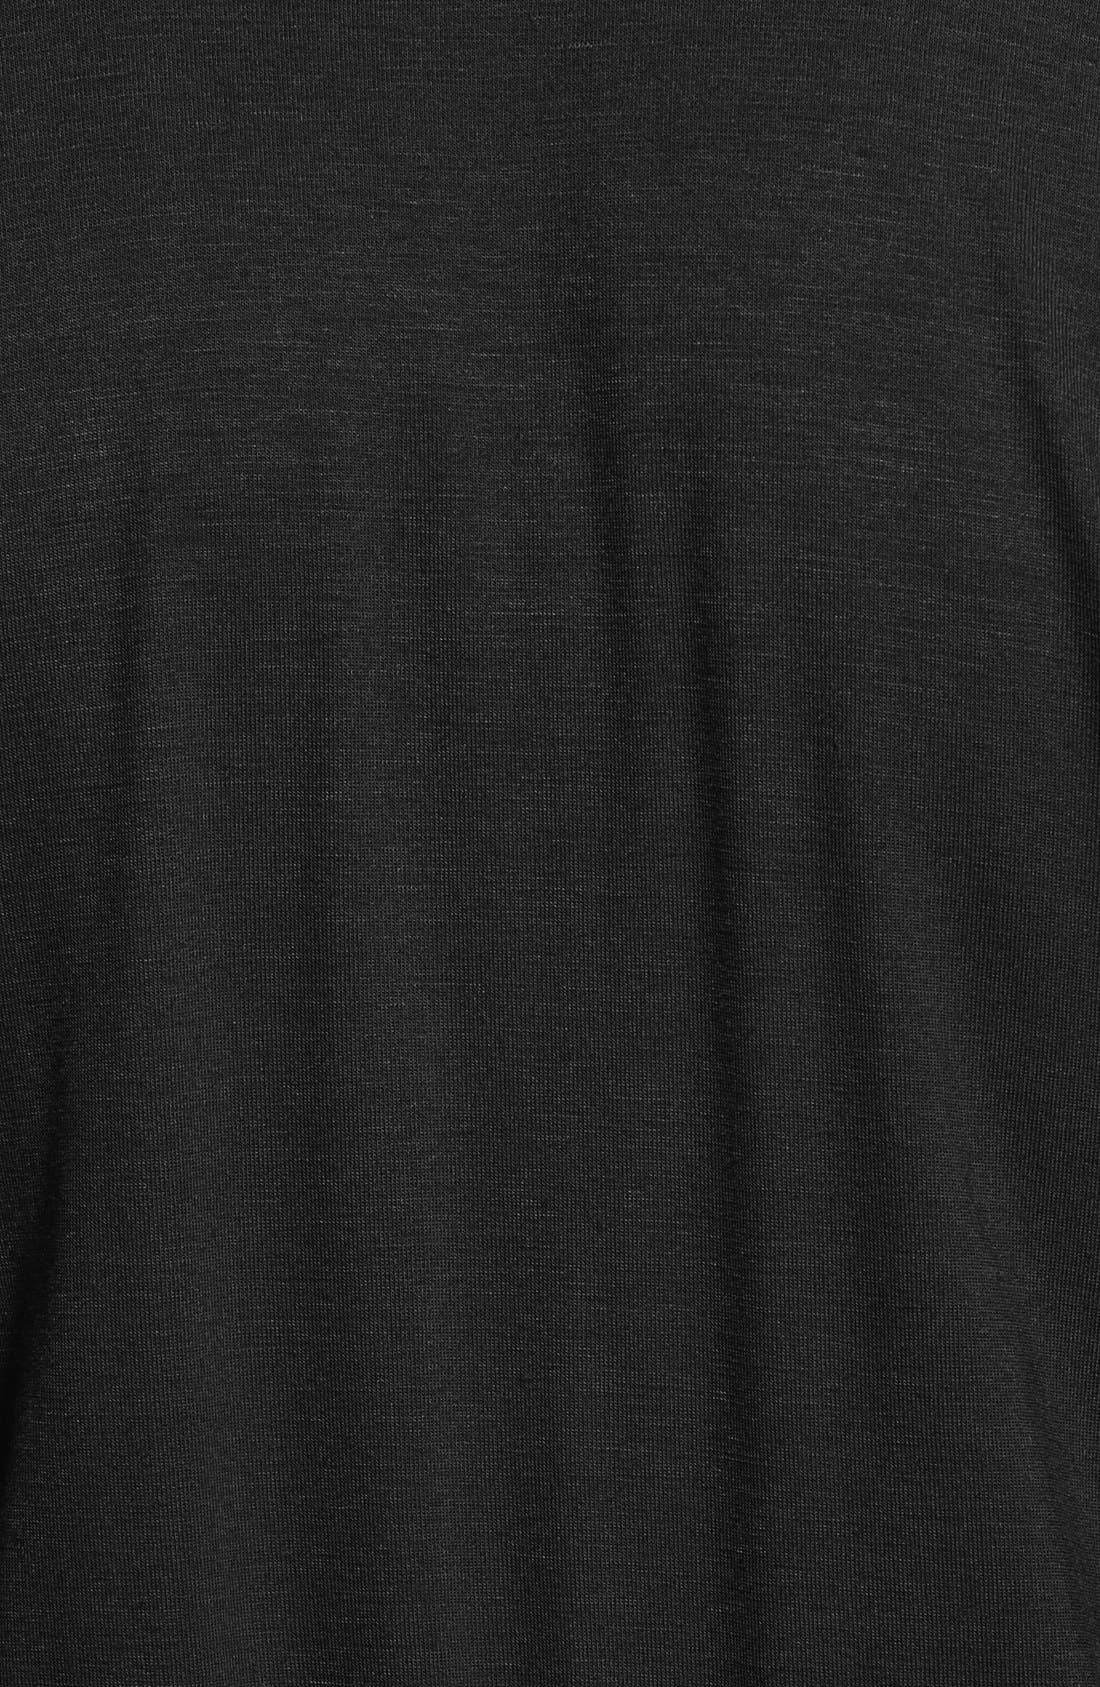 LOVEAPPELLA, Short Sleeve Wrap Top Jumpsuit, Alternate thumbnail 2, color, BLACK